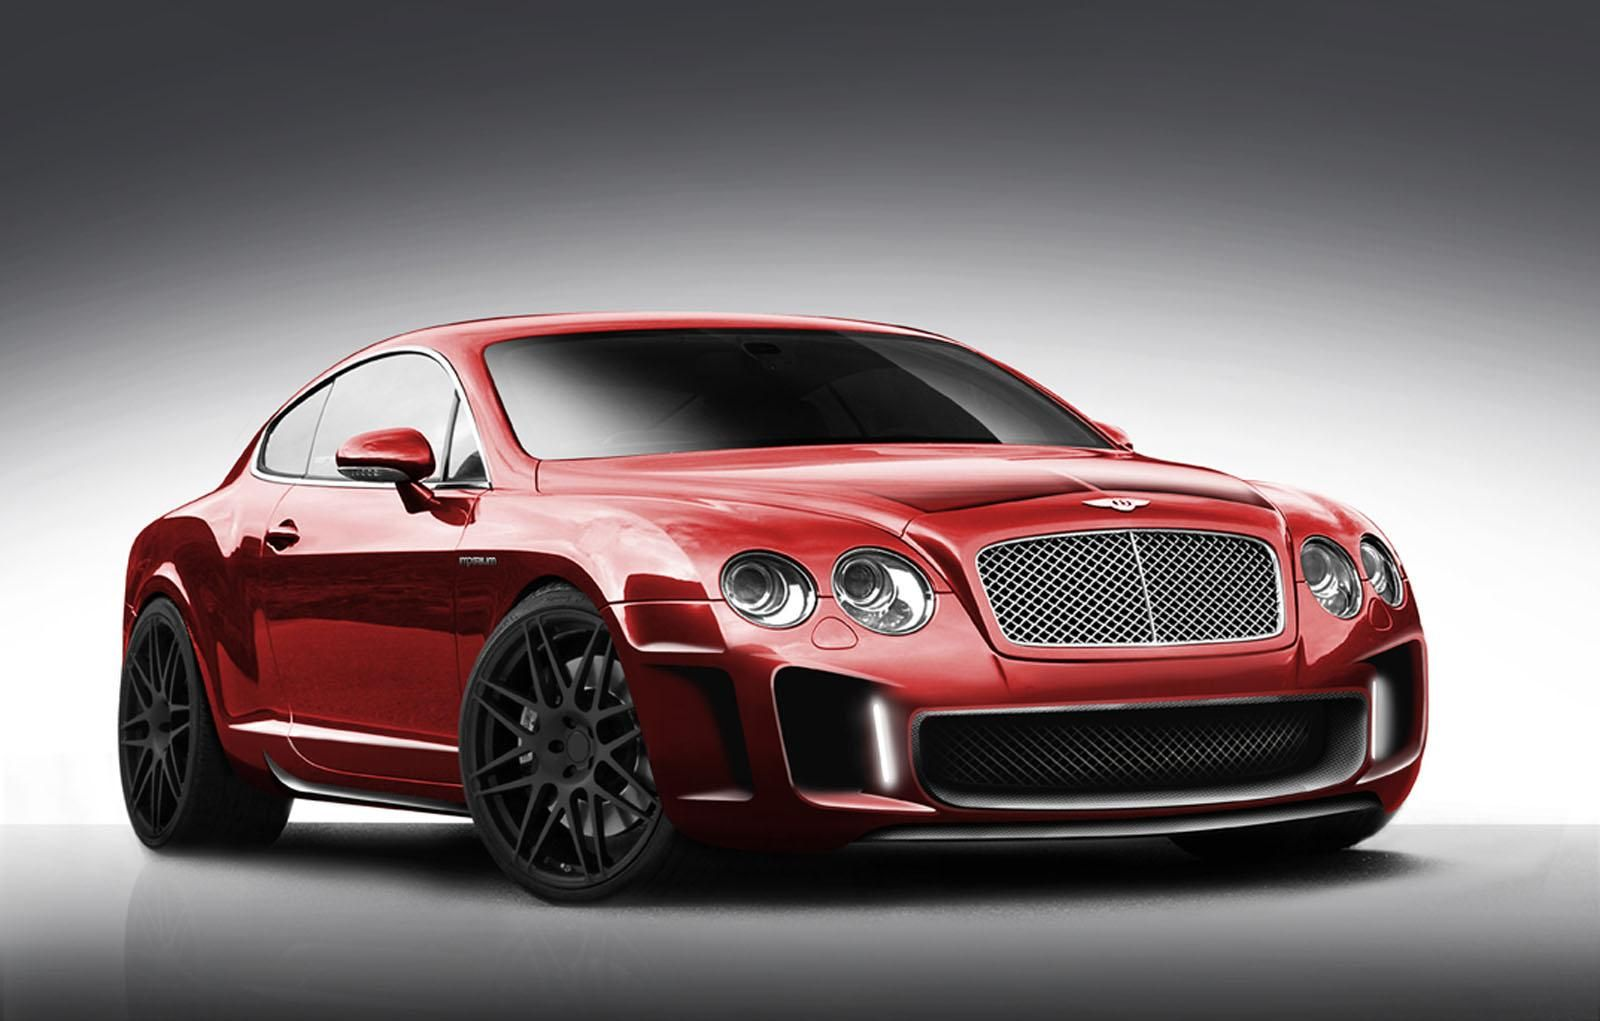 Bentley Luxury Car Photo Download Bentley Luxury Car Photo